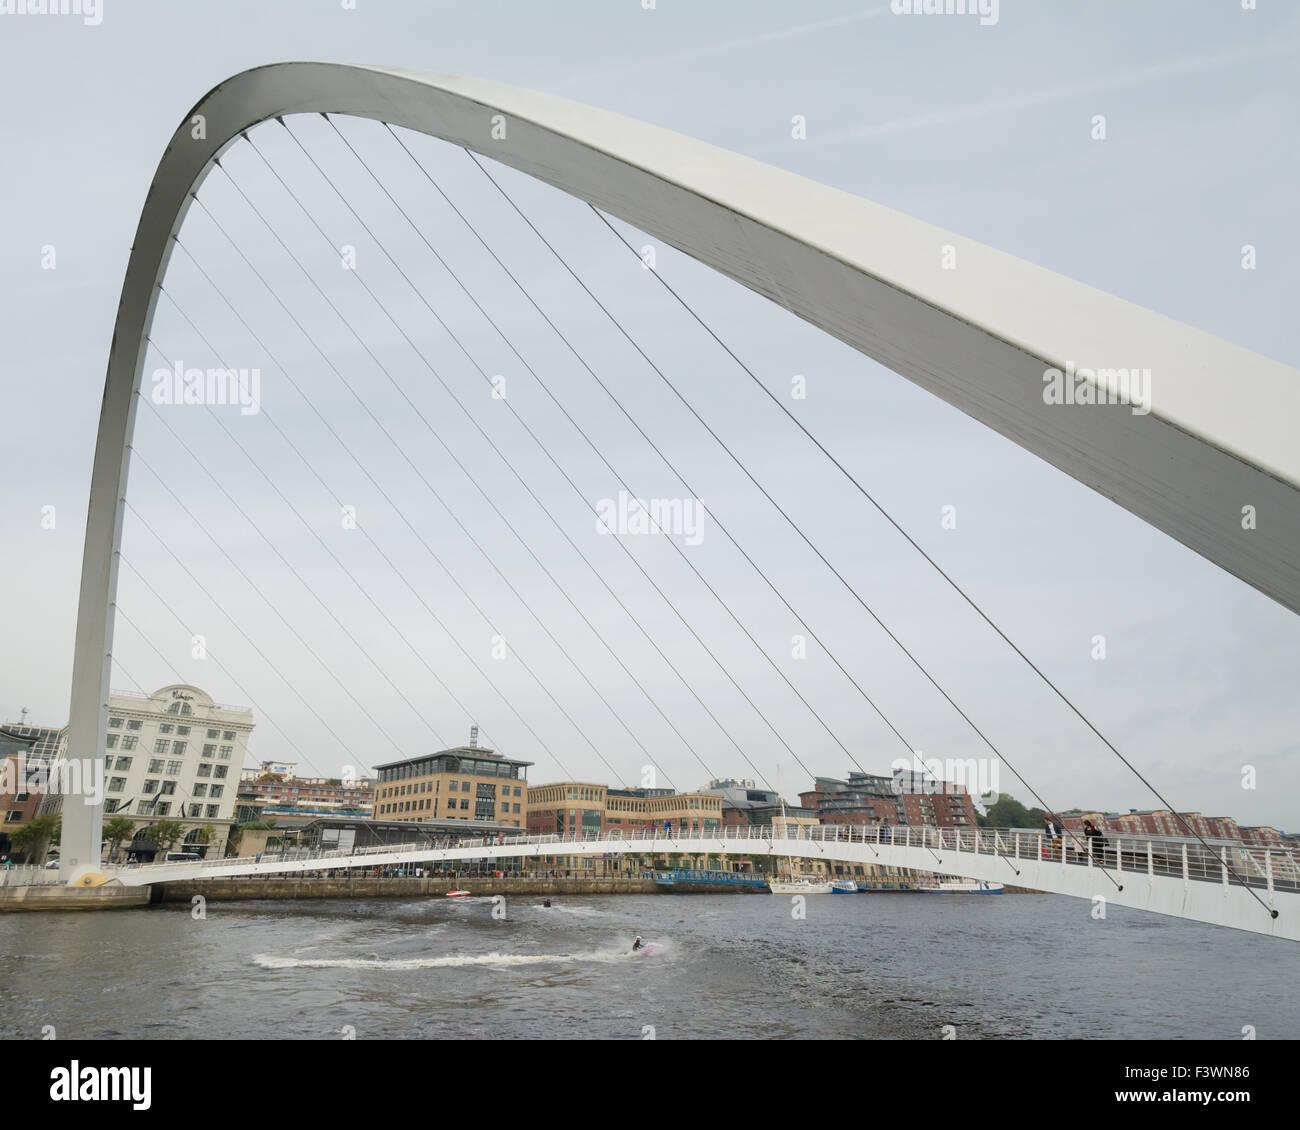 Jet skier passing under the Gateshead Millennium Bridge on the River Tyne - Stock Image